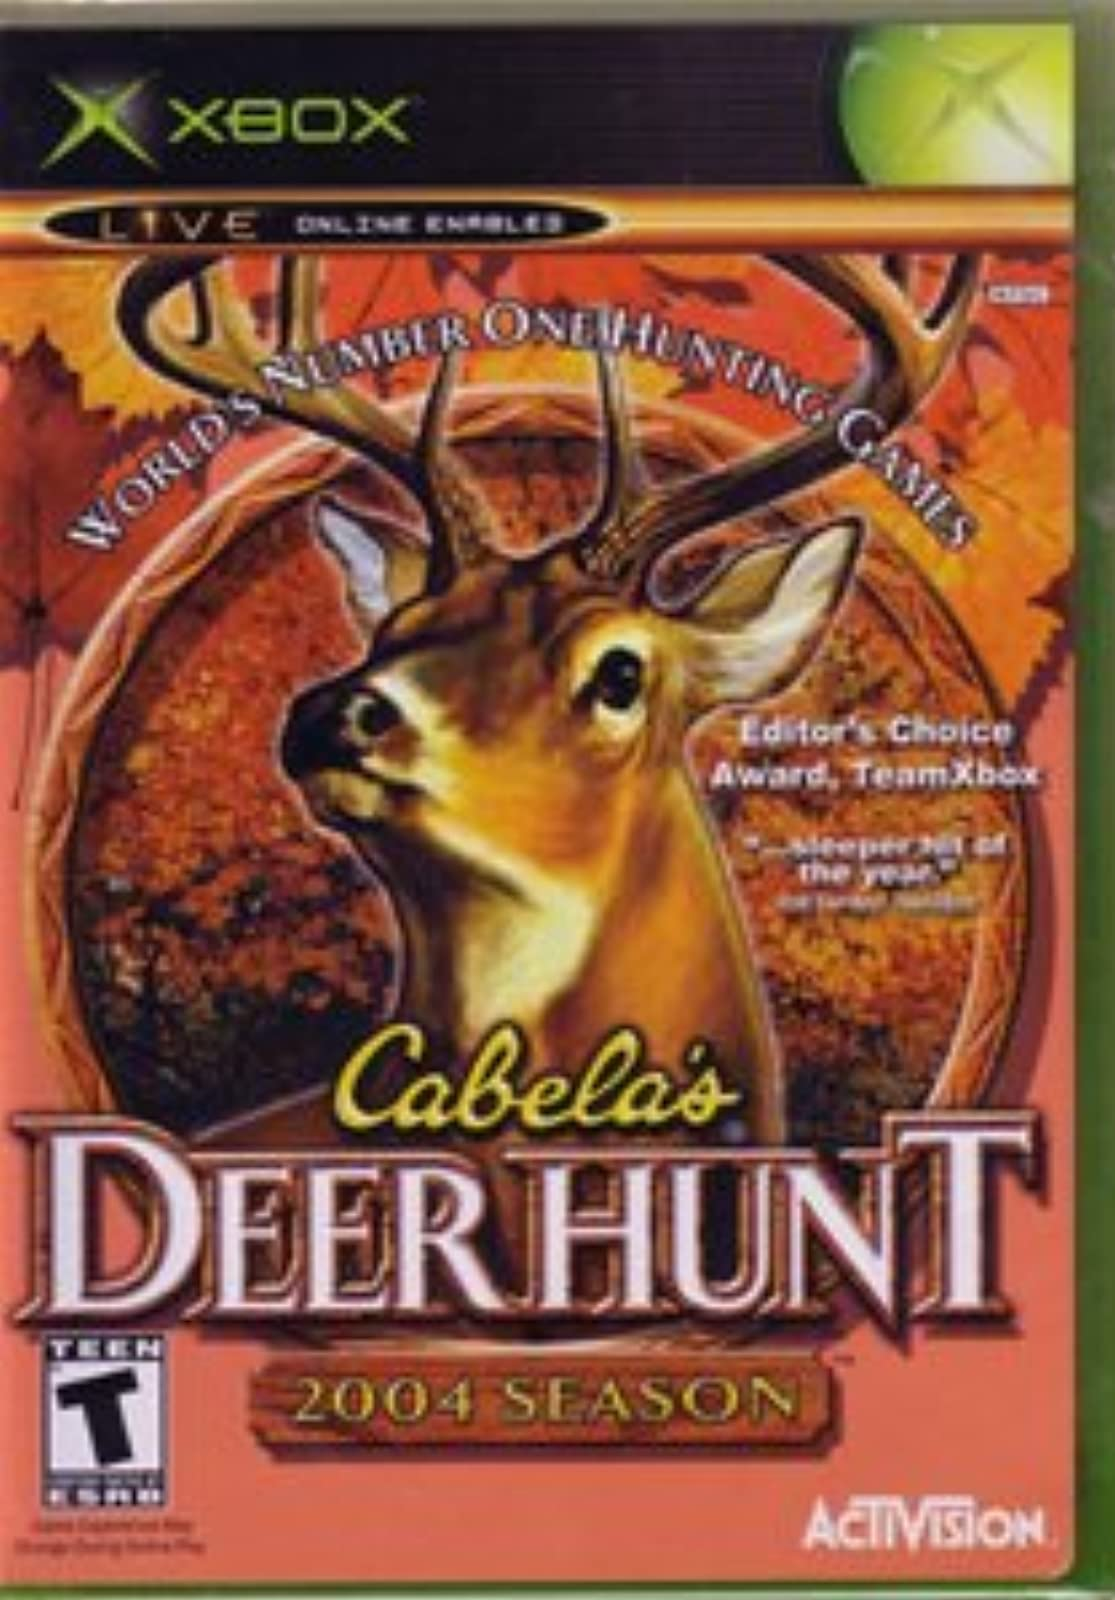 Cabela's Deer Hunt: 2004 Season For Xbox Original